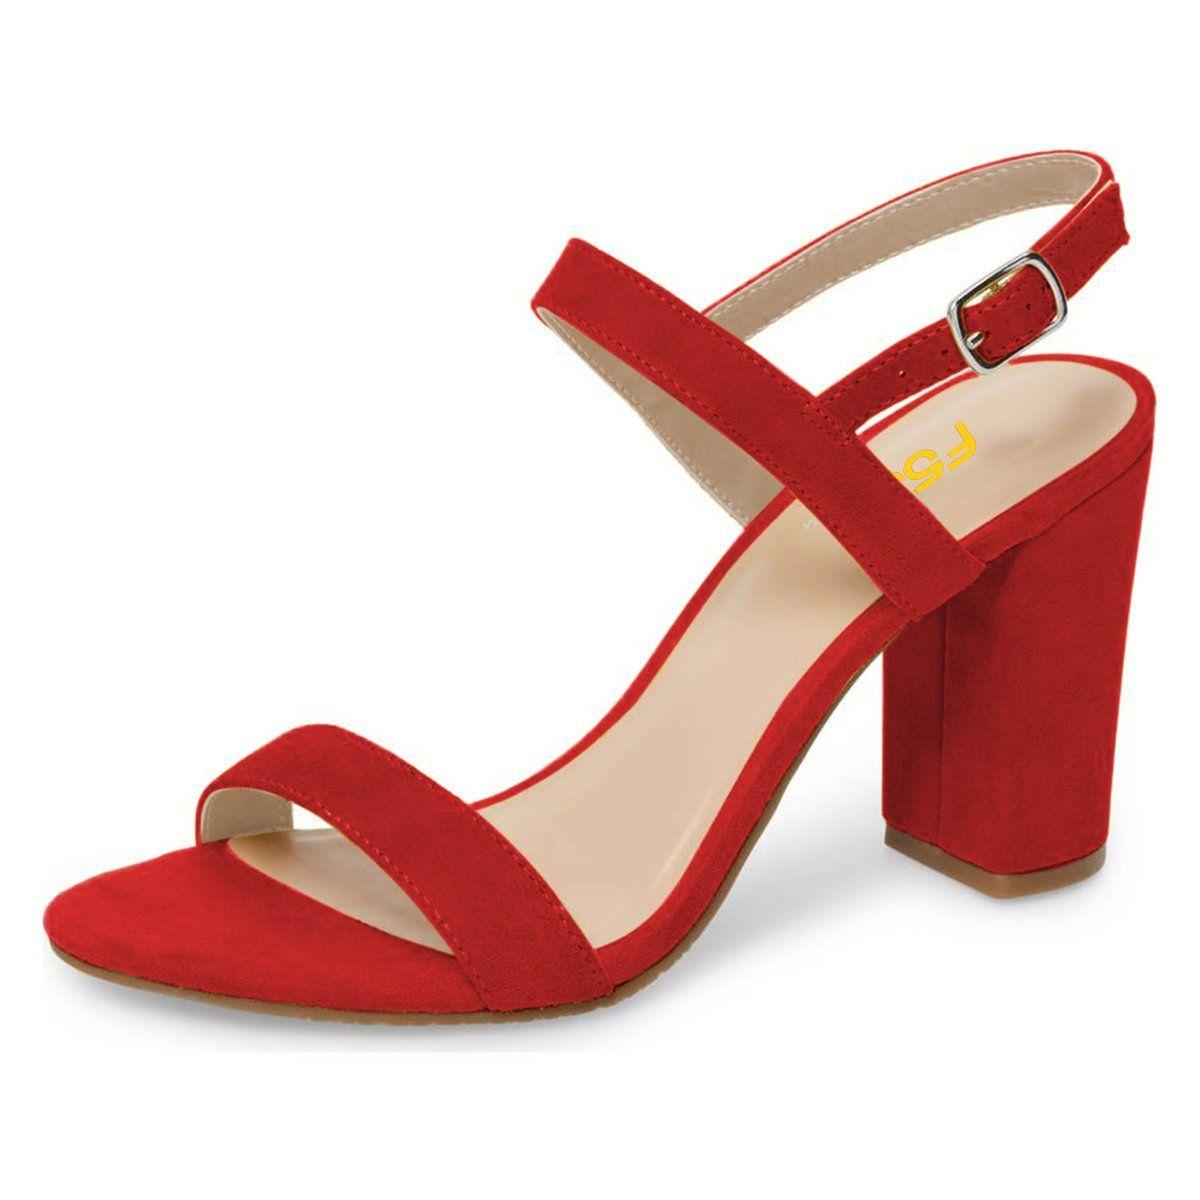 e618c9343df FSJ Women Casual Ankle Strap Sandals Open Toe Block Chunky High ...